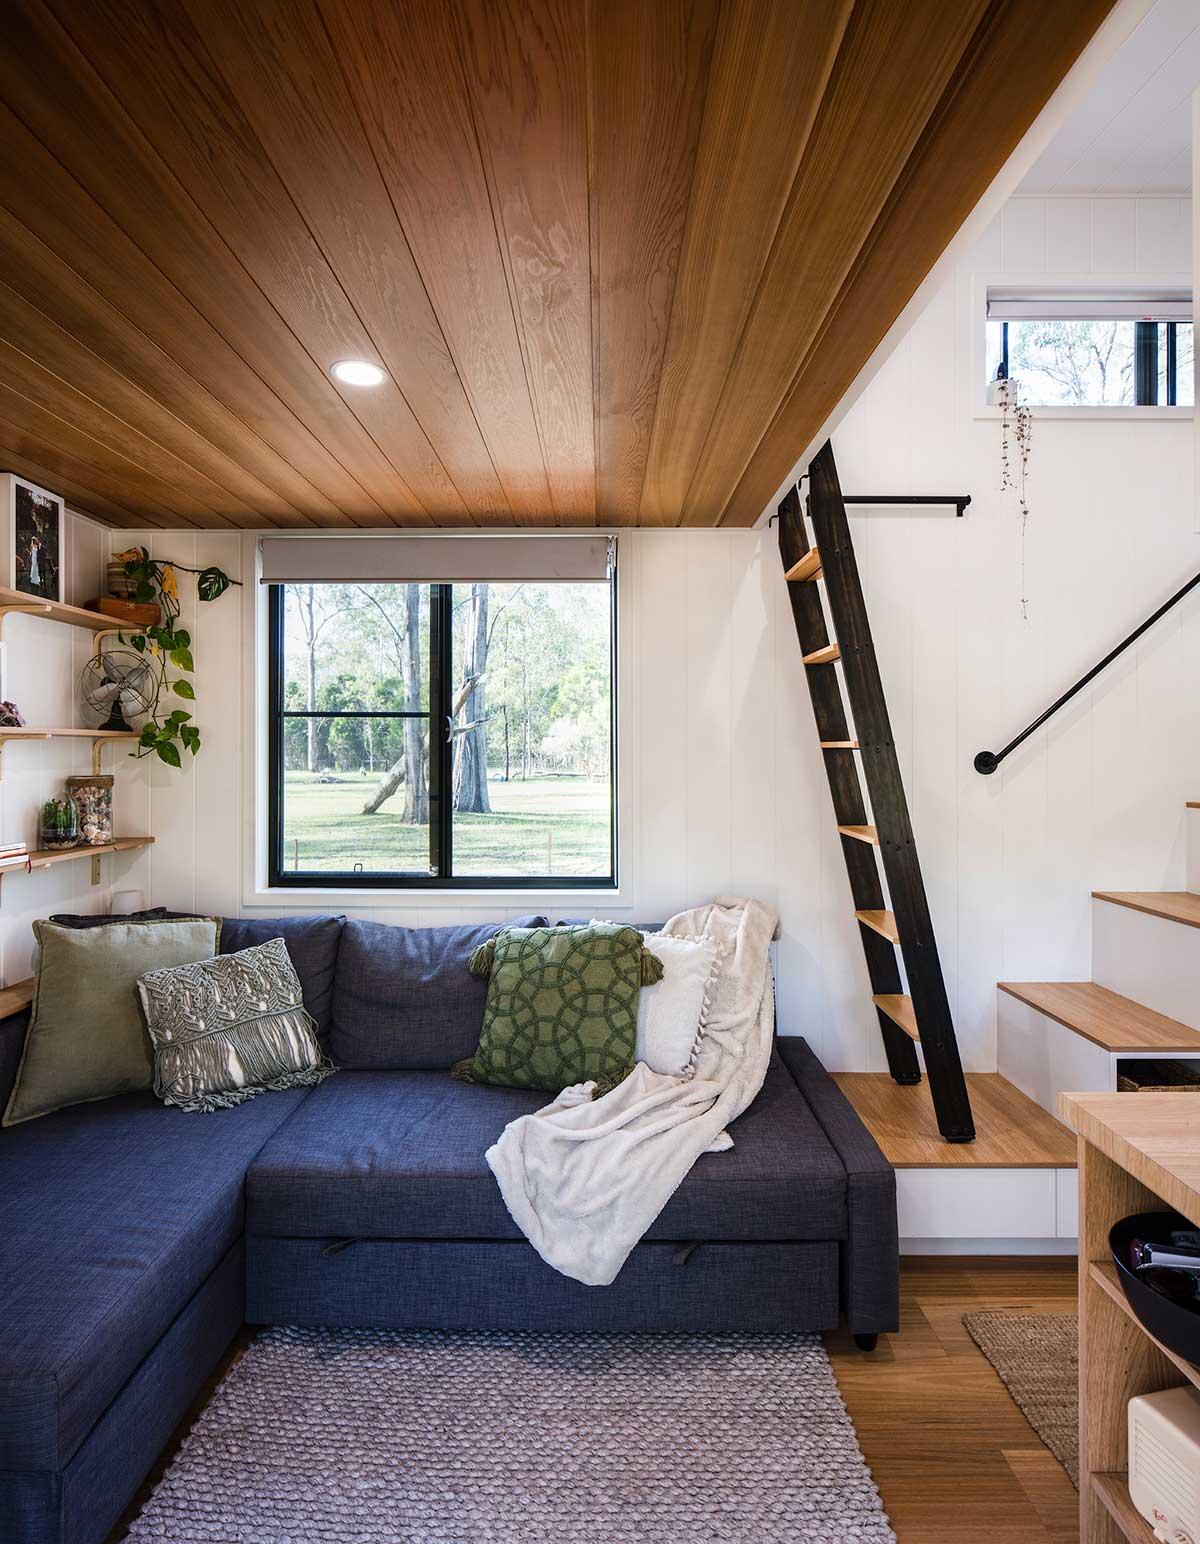 A living room space inside a tiny home